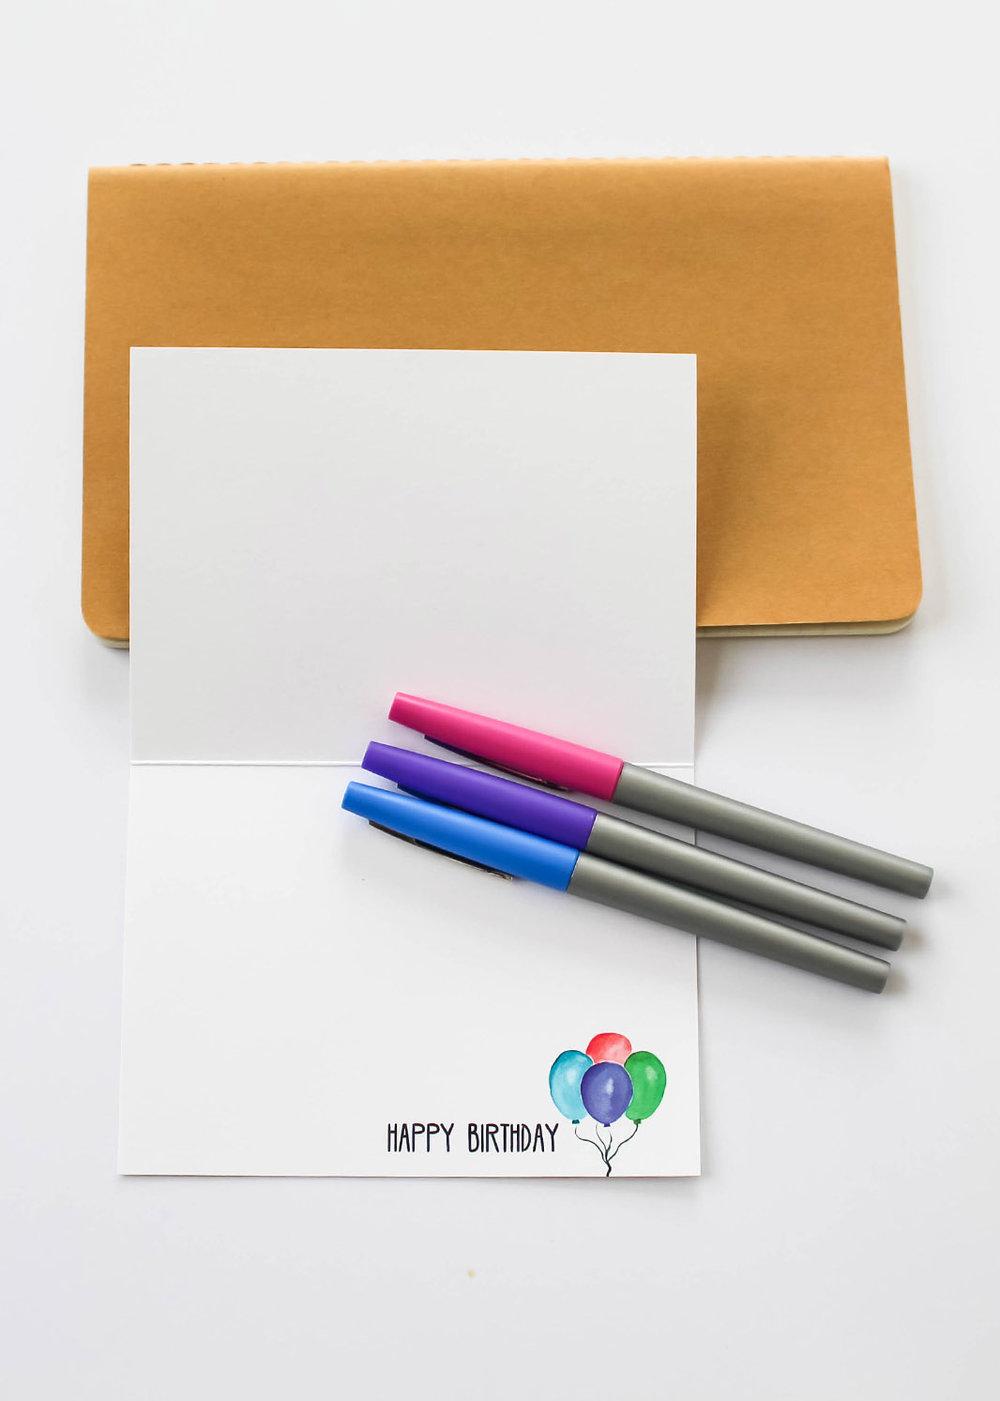 Cafe Notes + Company Open Birthday Notebook Pens.jpg